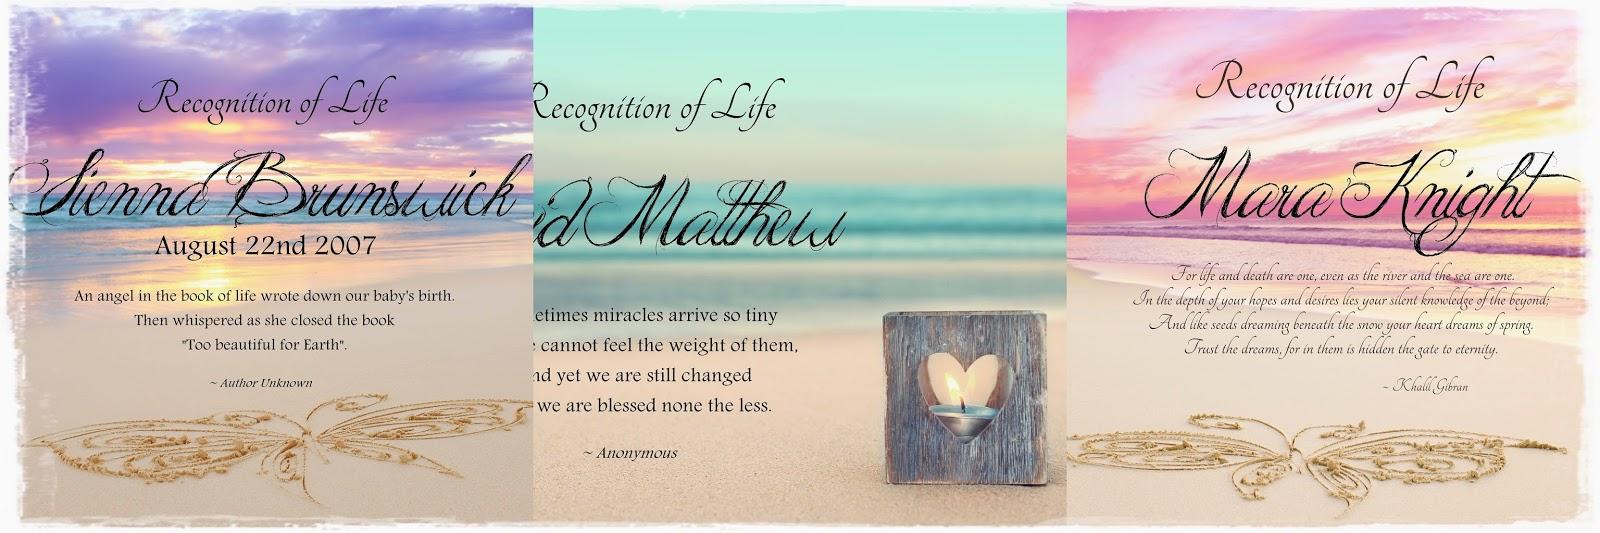 http://theseashoreofremembrance.blogspot.com.au/2013/02/recognition-of-life-images.html